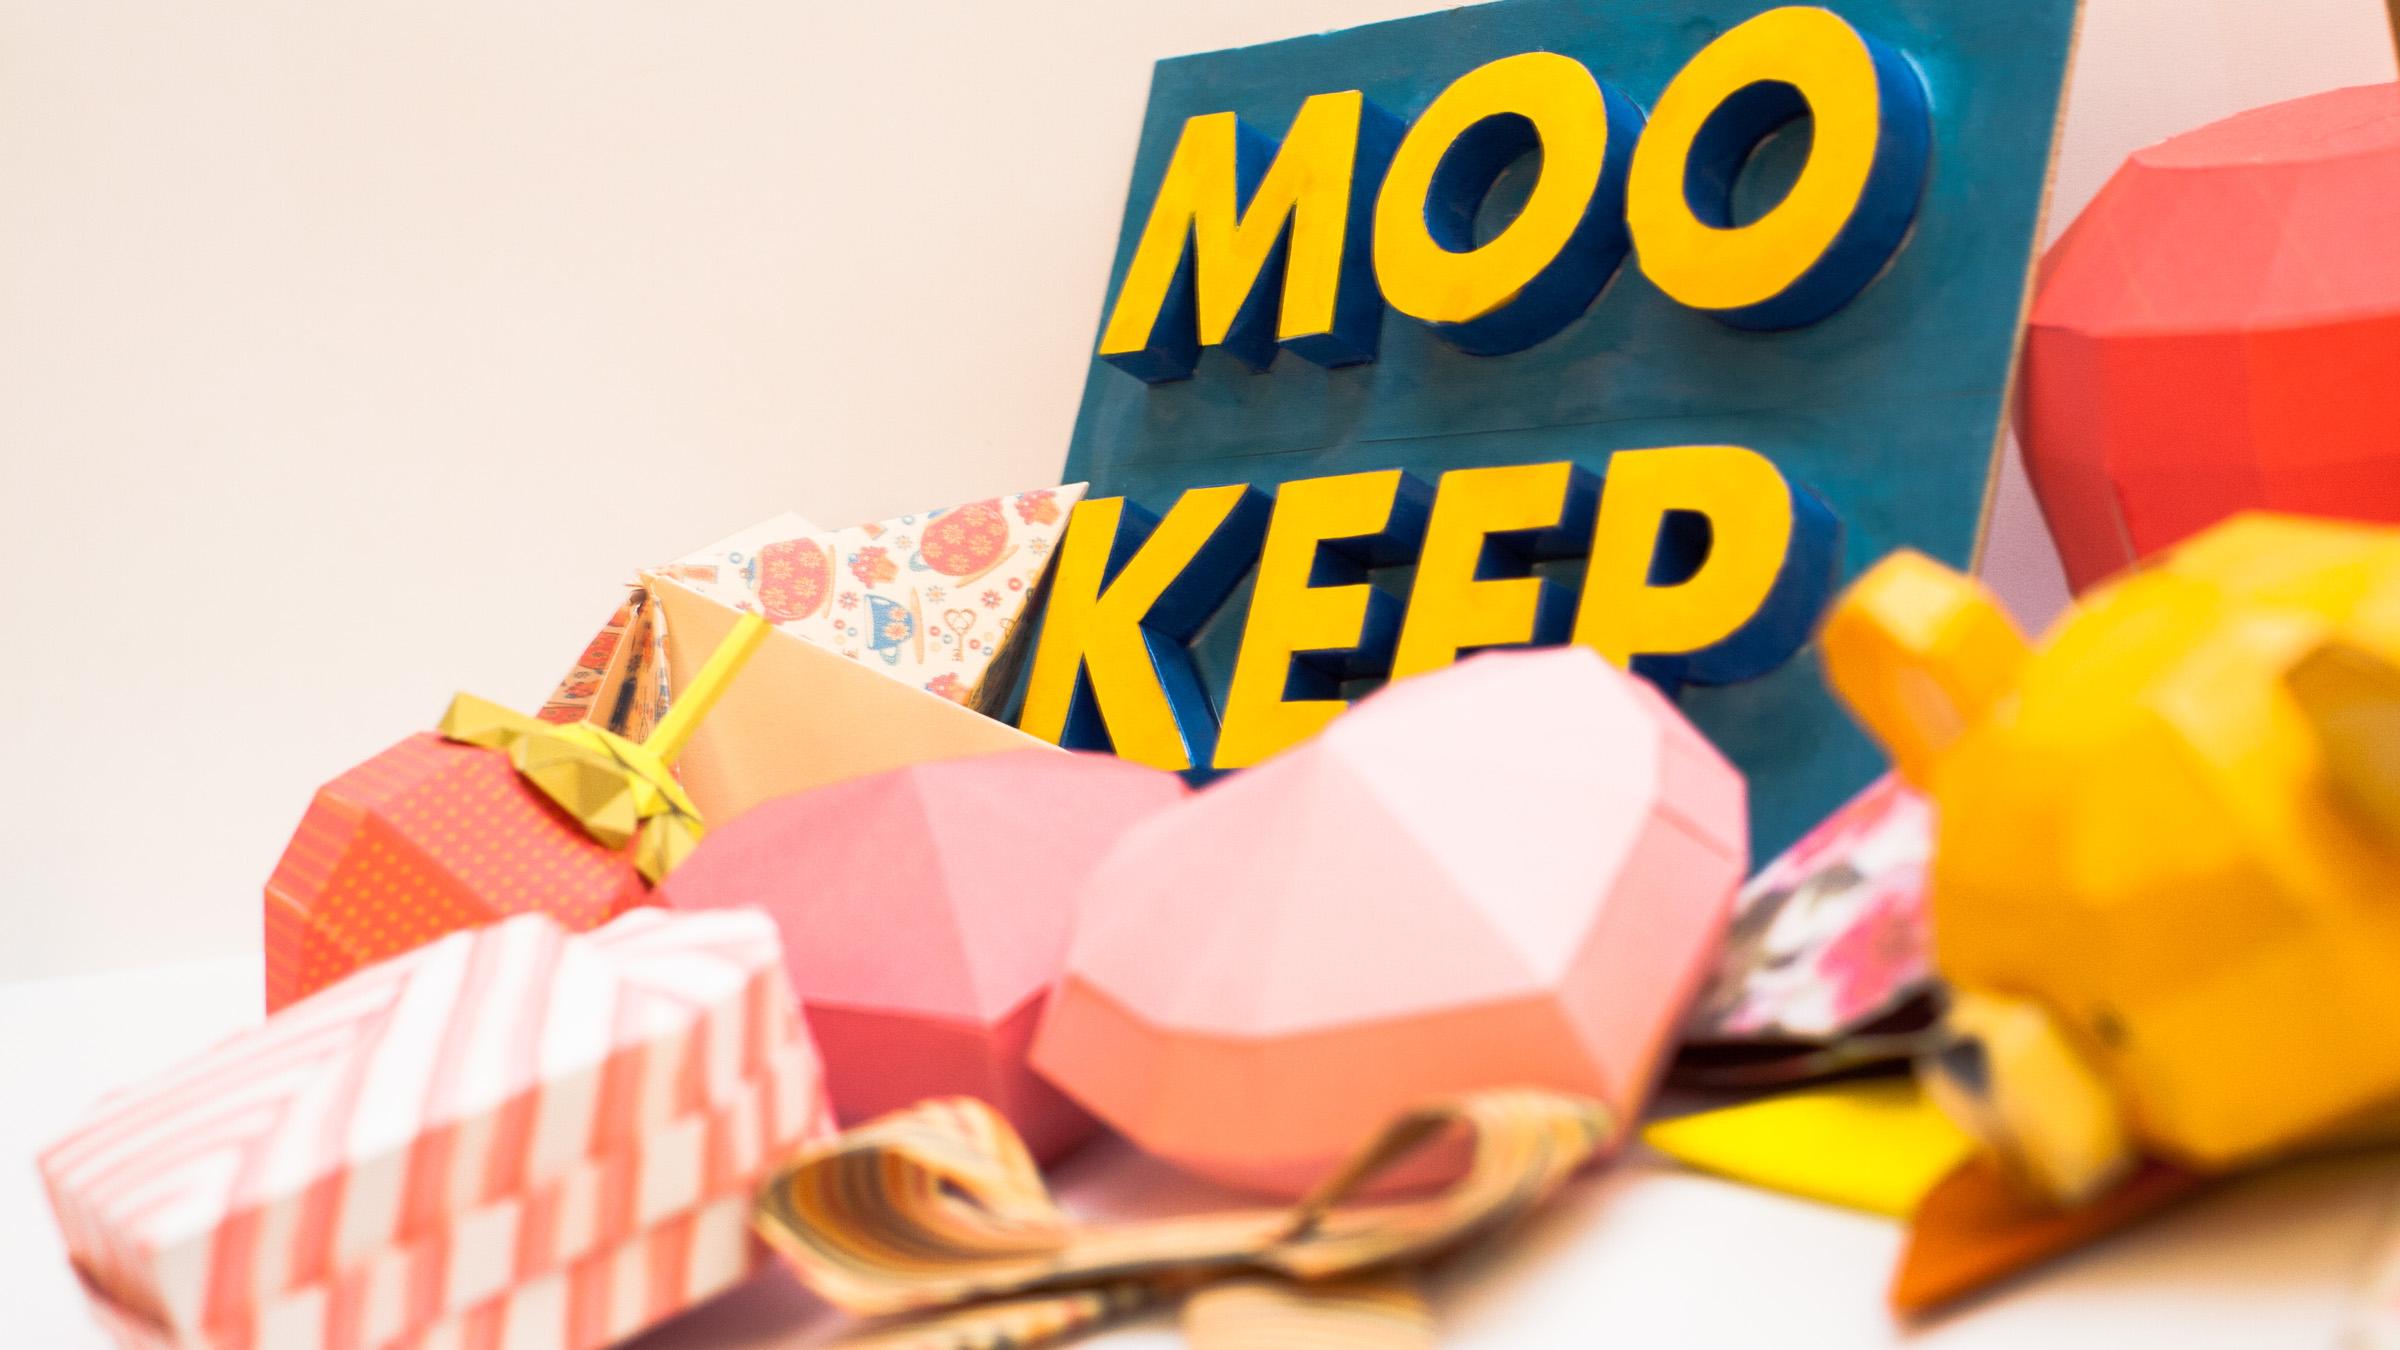 Mookeep.com Papercaft & Origami - January 2014 01